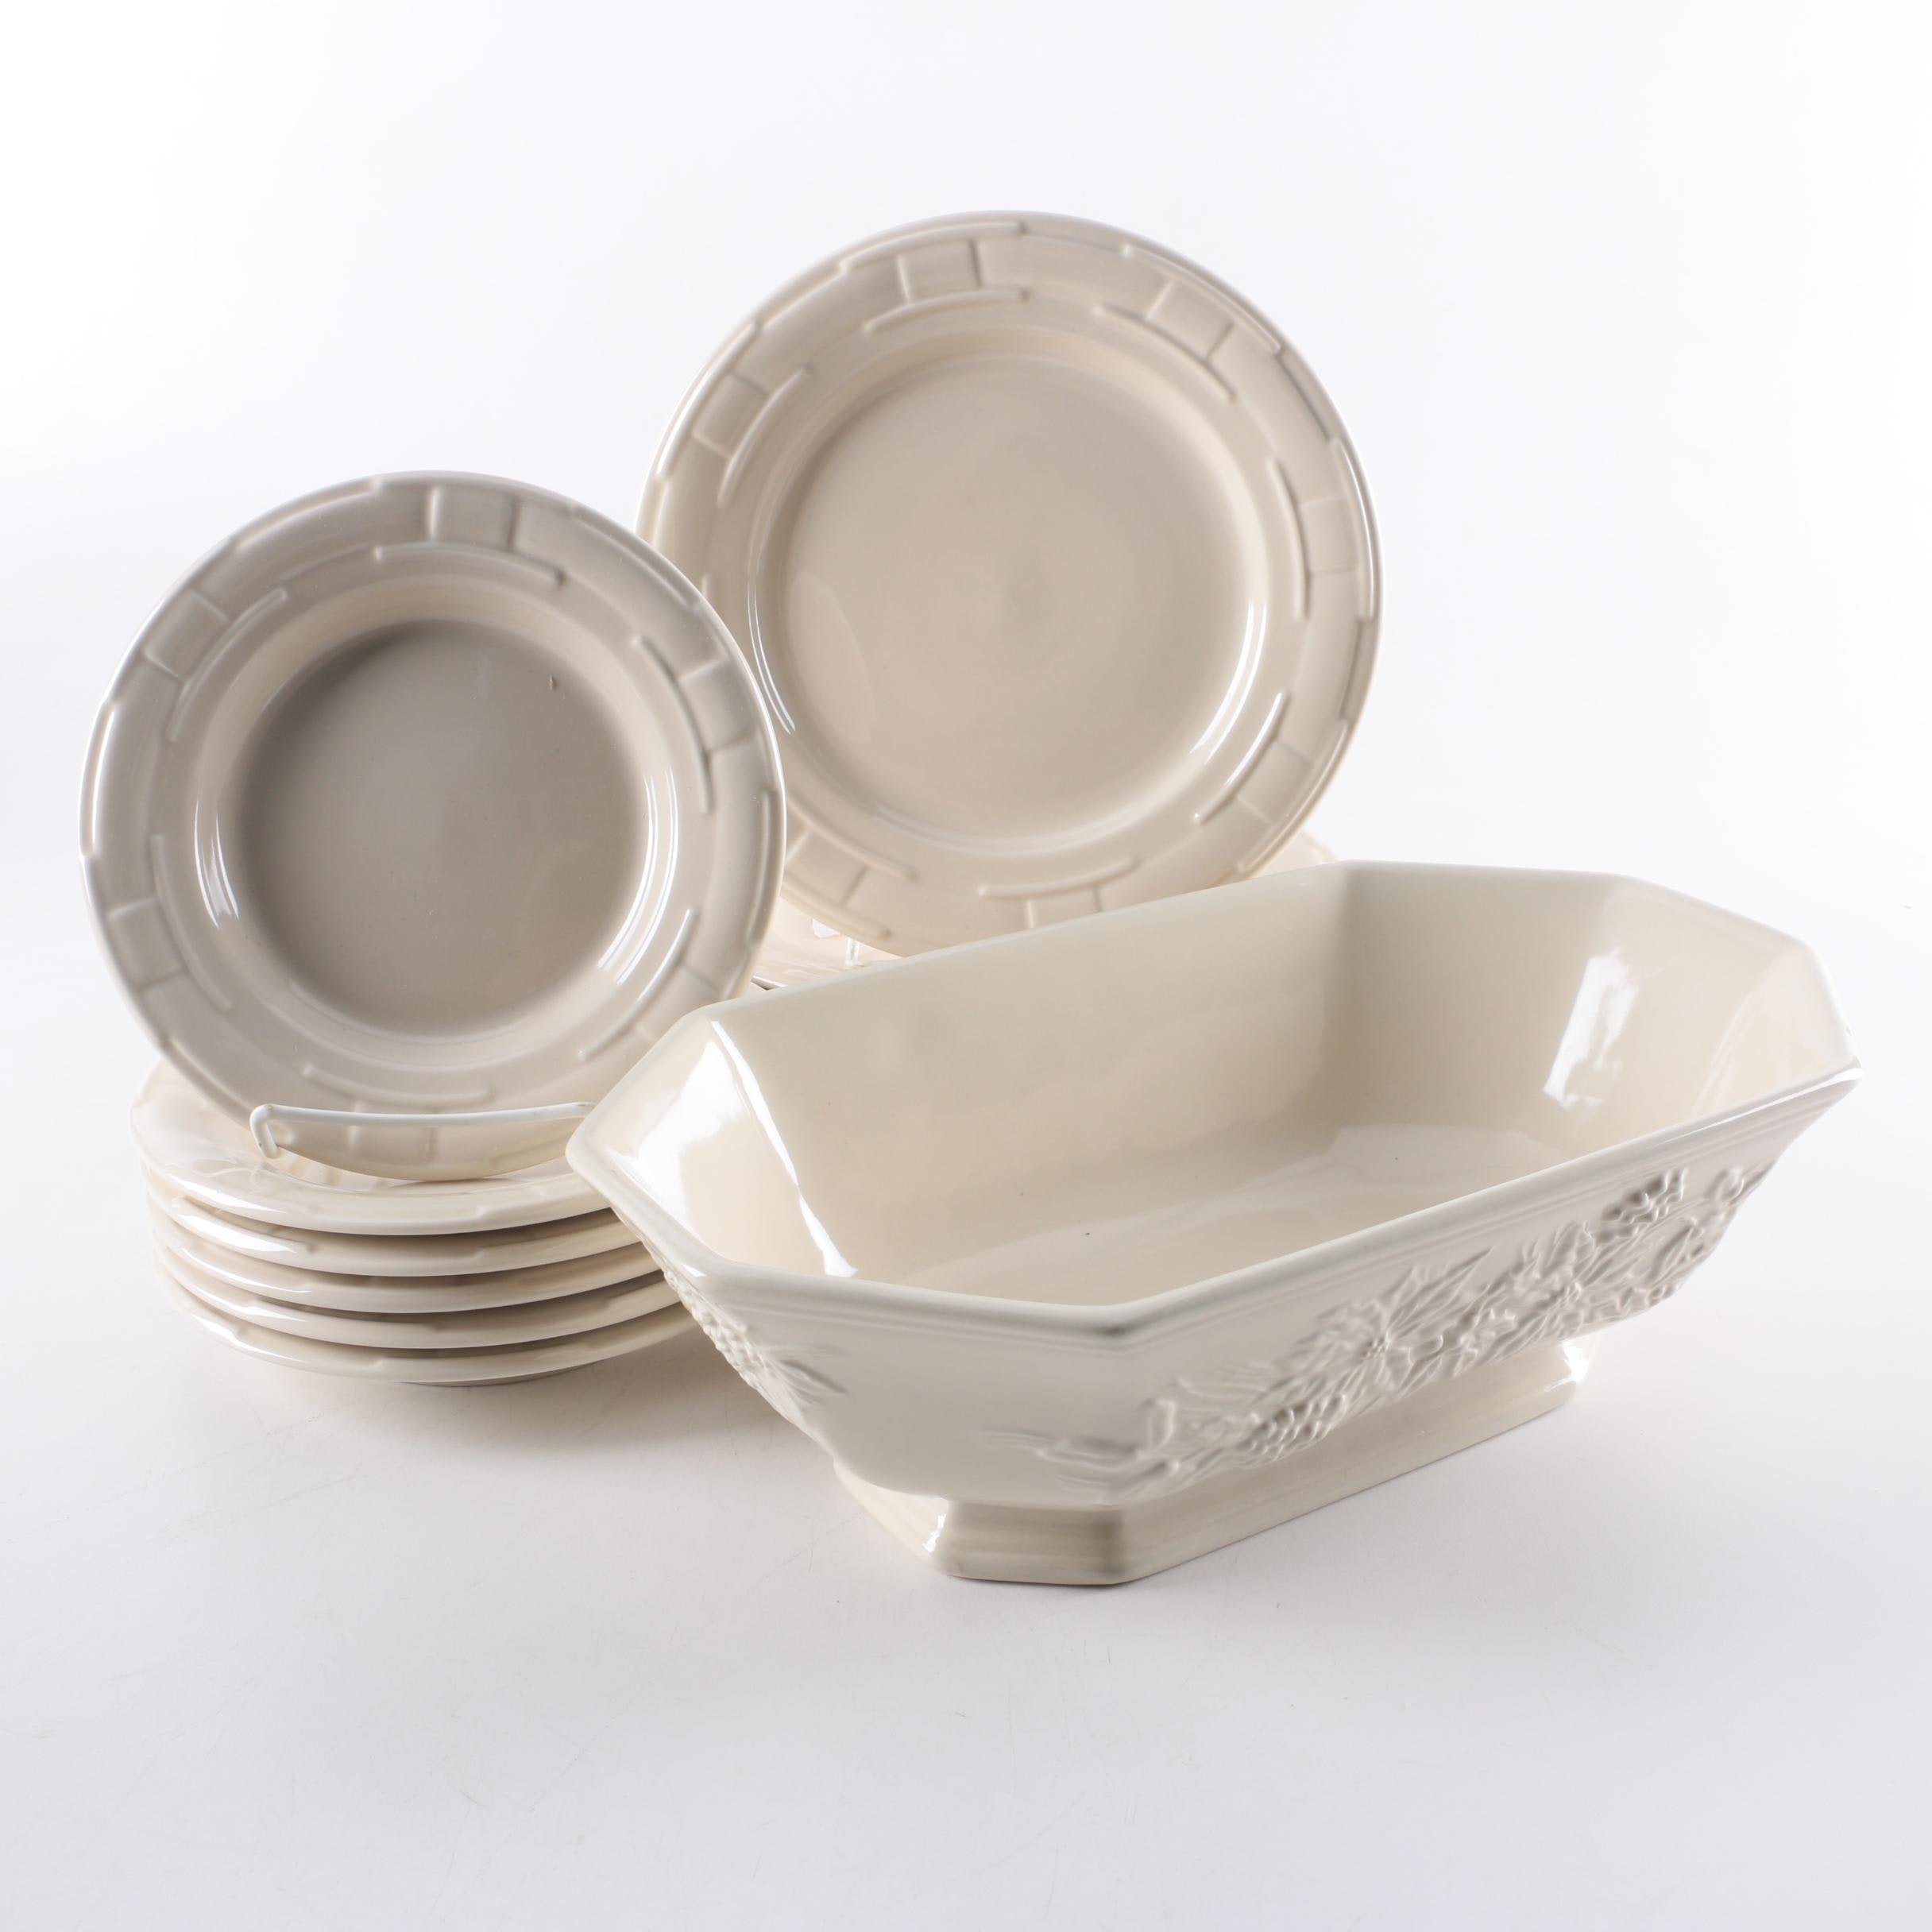 Longaberger Pottery  Woven Traditions Ivory  ...  sc 1 st  EBTH.com & Longaberger Pottery